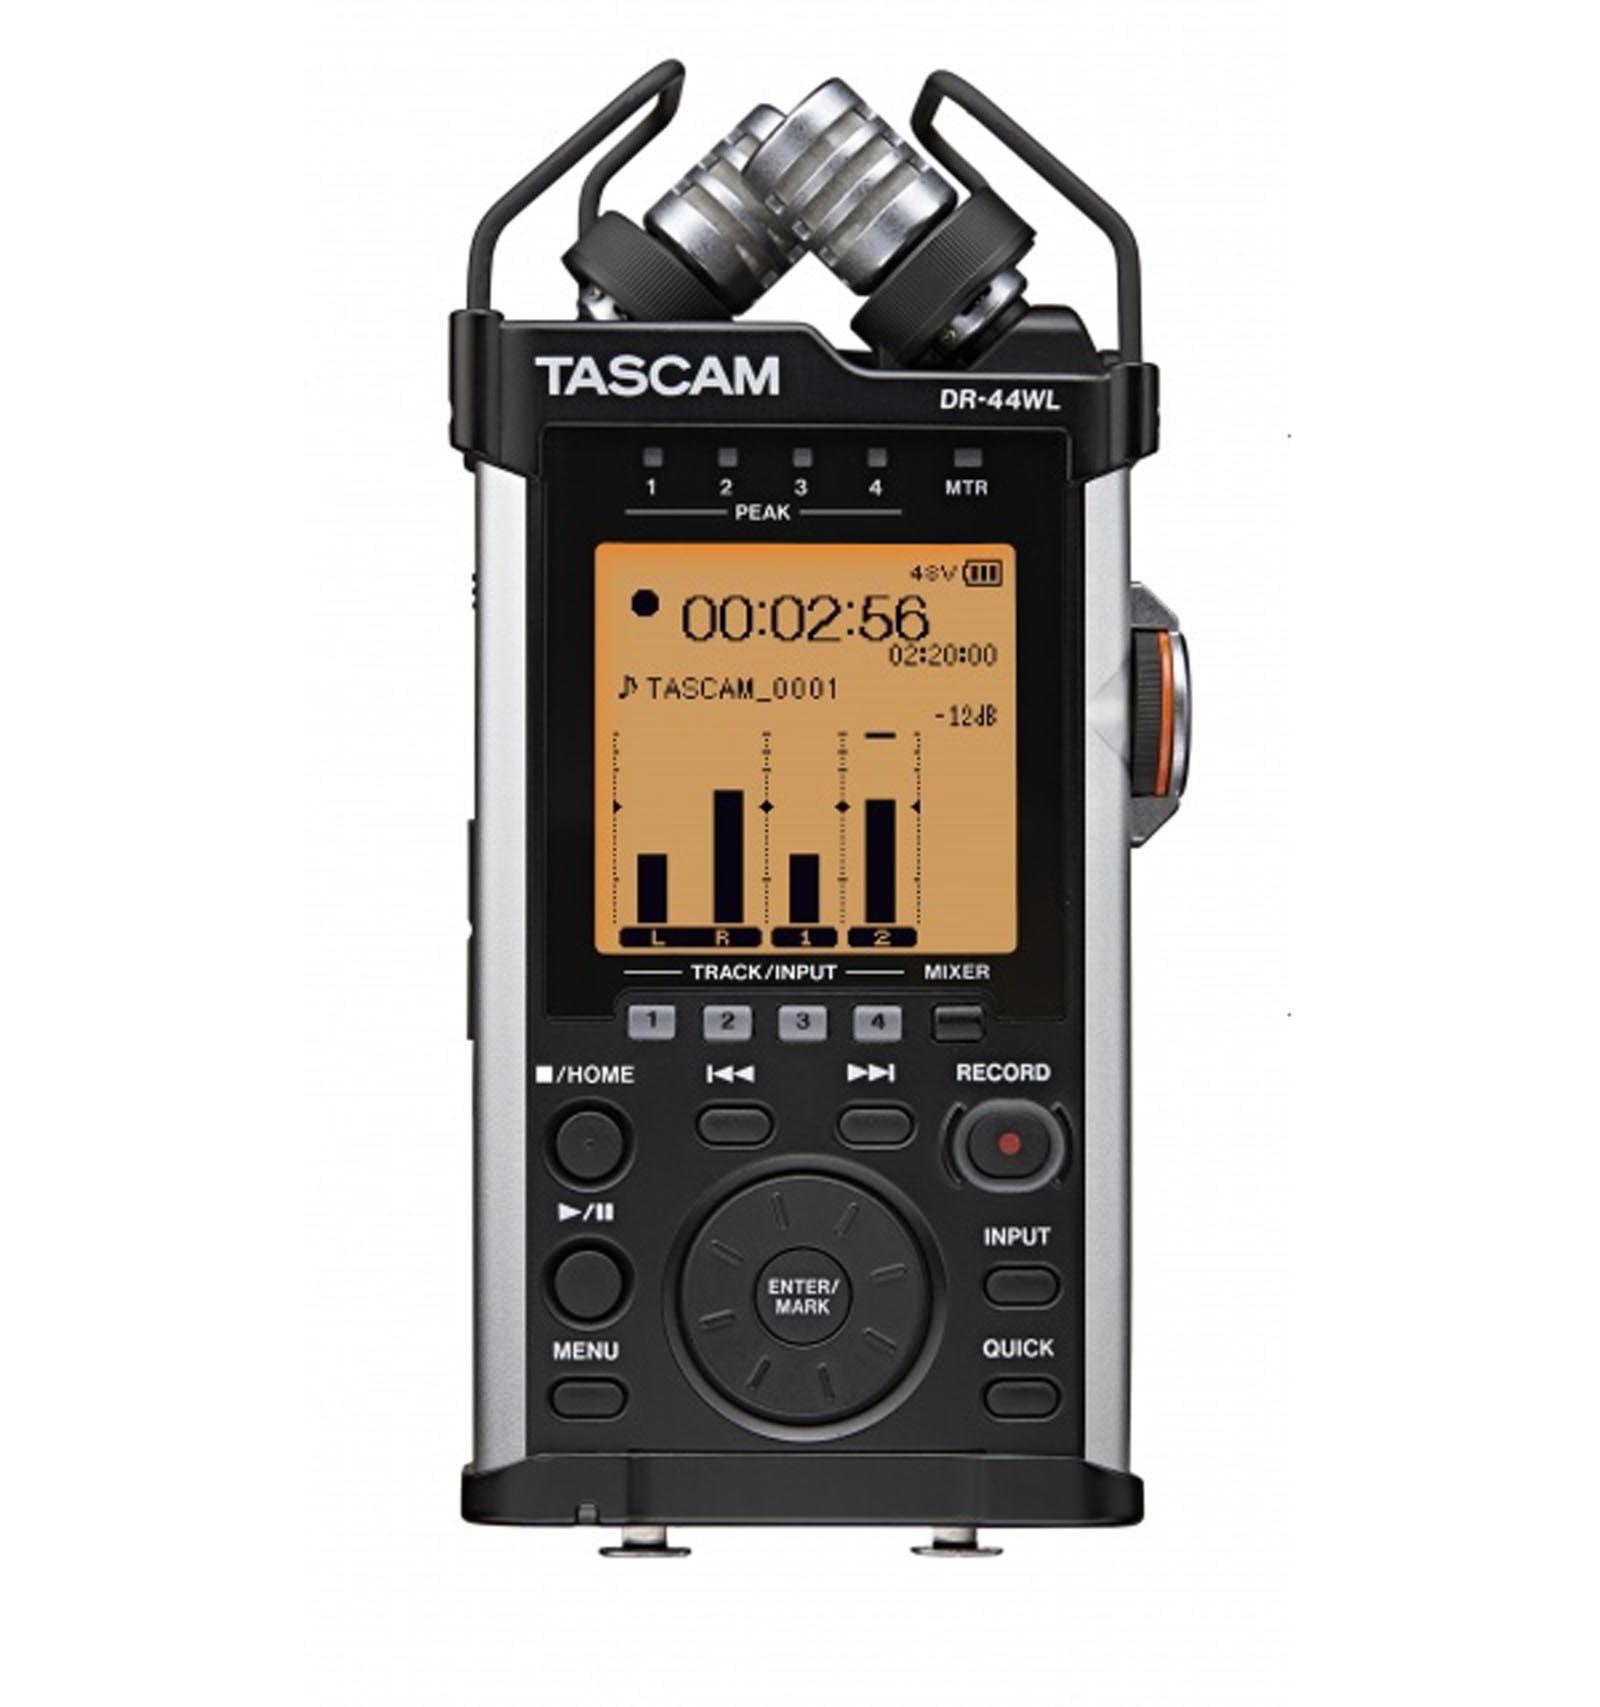 TASCAM DR-44WL Handheld Portable Wi-Fi Linear PCM Audio Recorder w/ 4GB SD Card